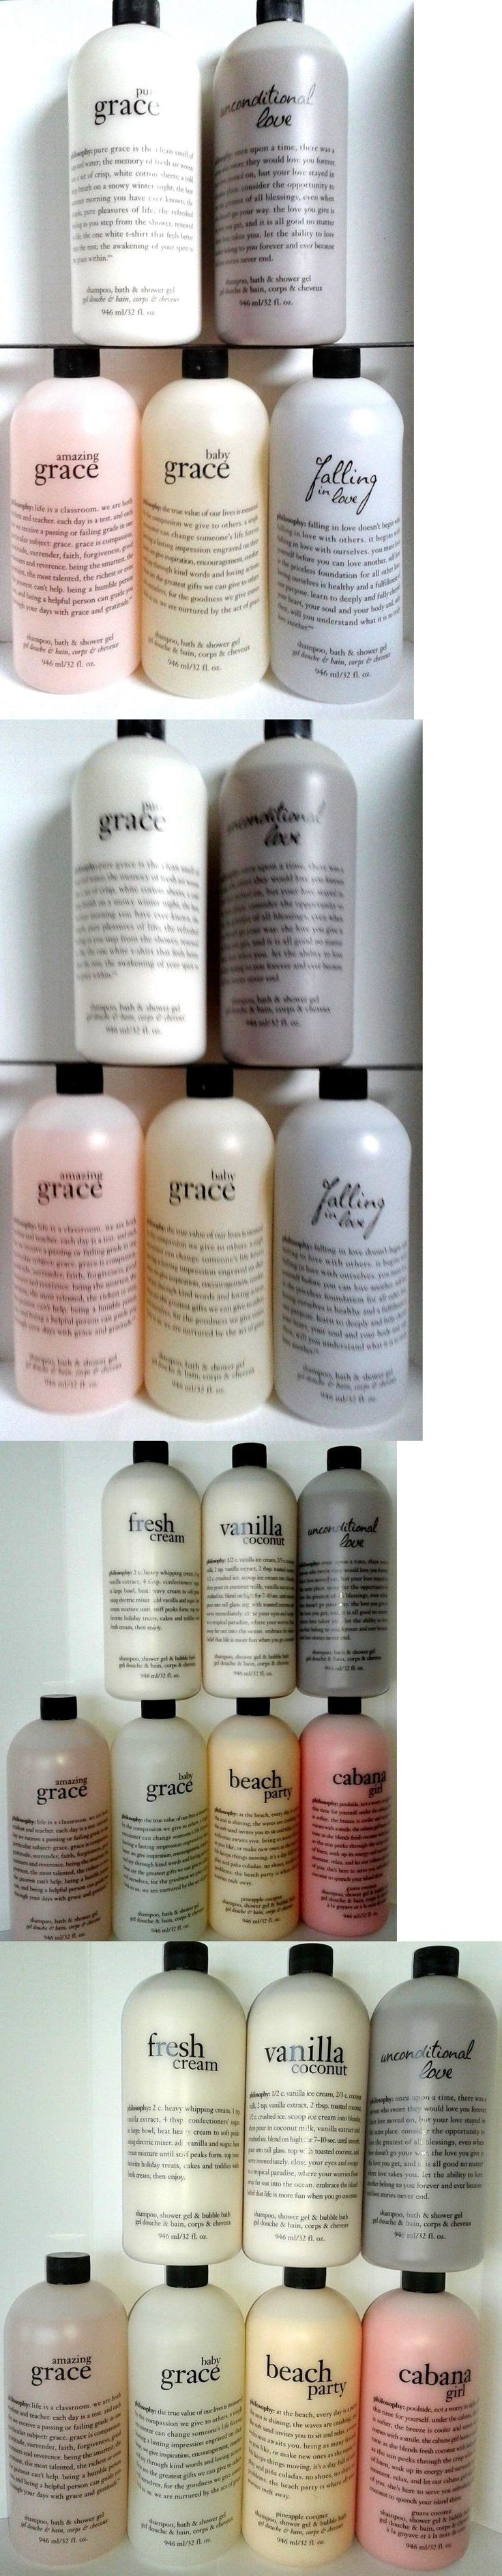 best 25 philosophy shower gel ideas on pinterest shower gel body washes and shower gels philosophy shampoo bath and shower gel 32oz sealed pick